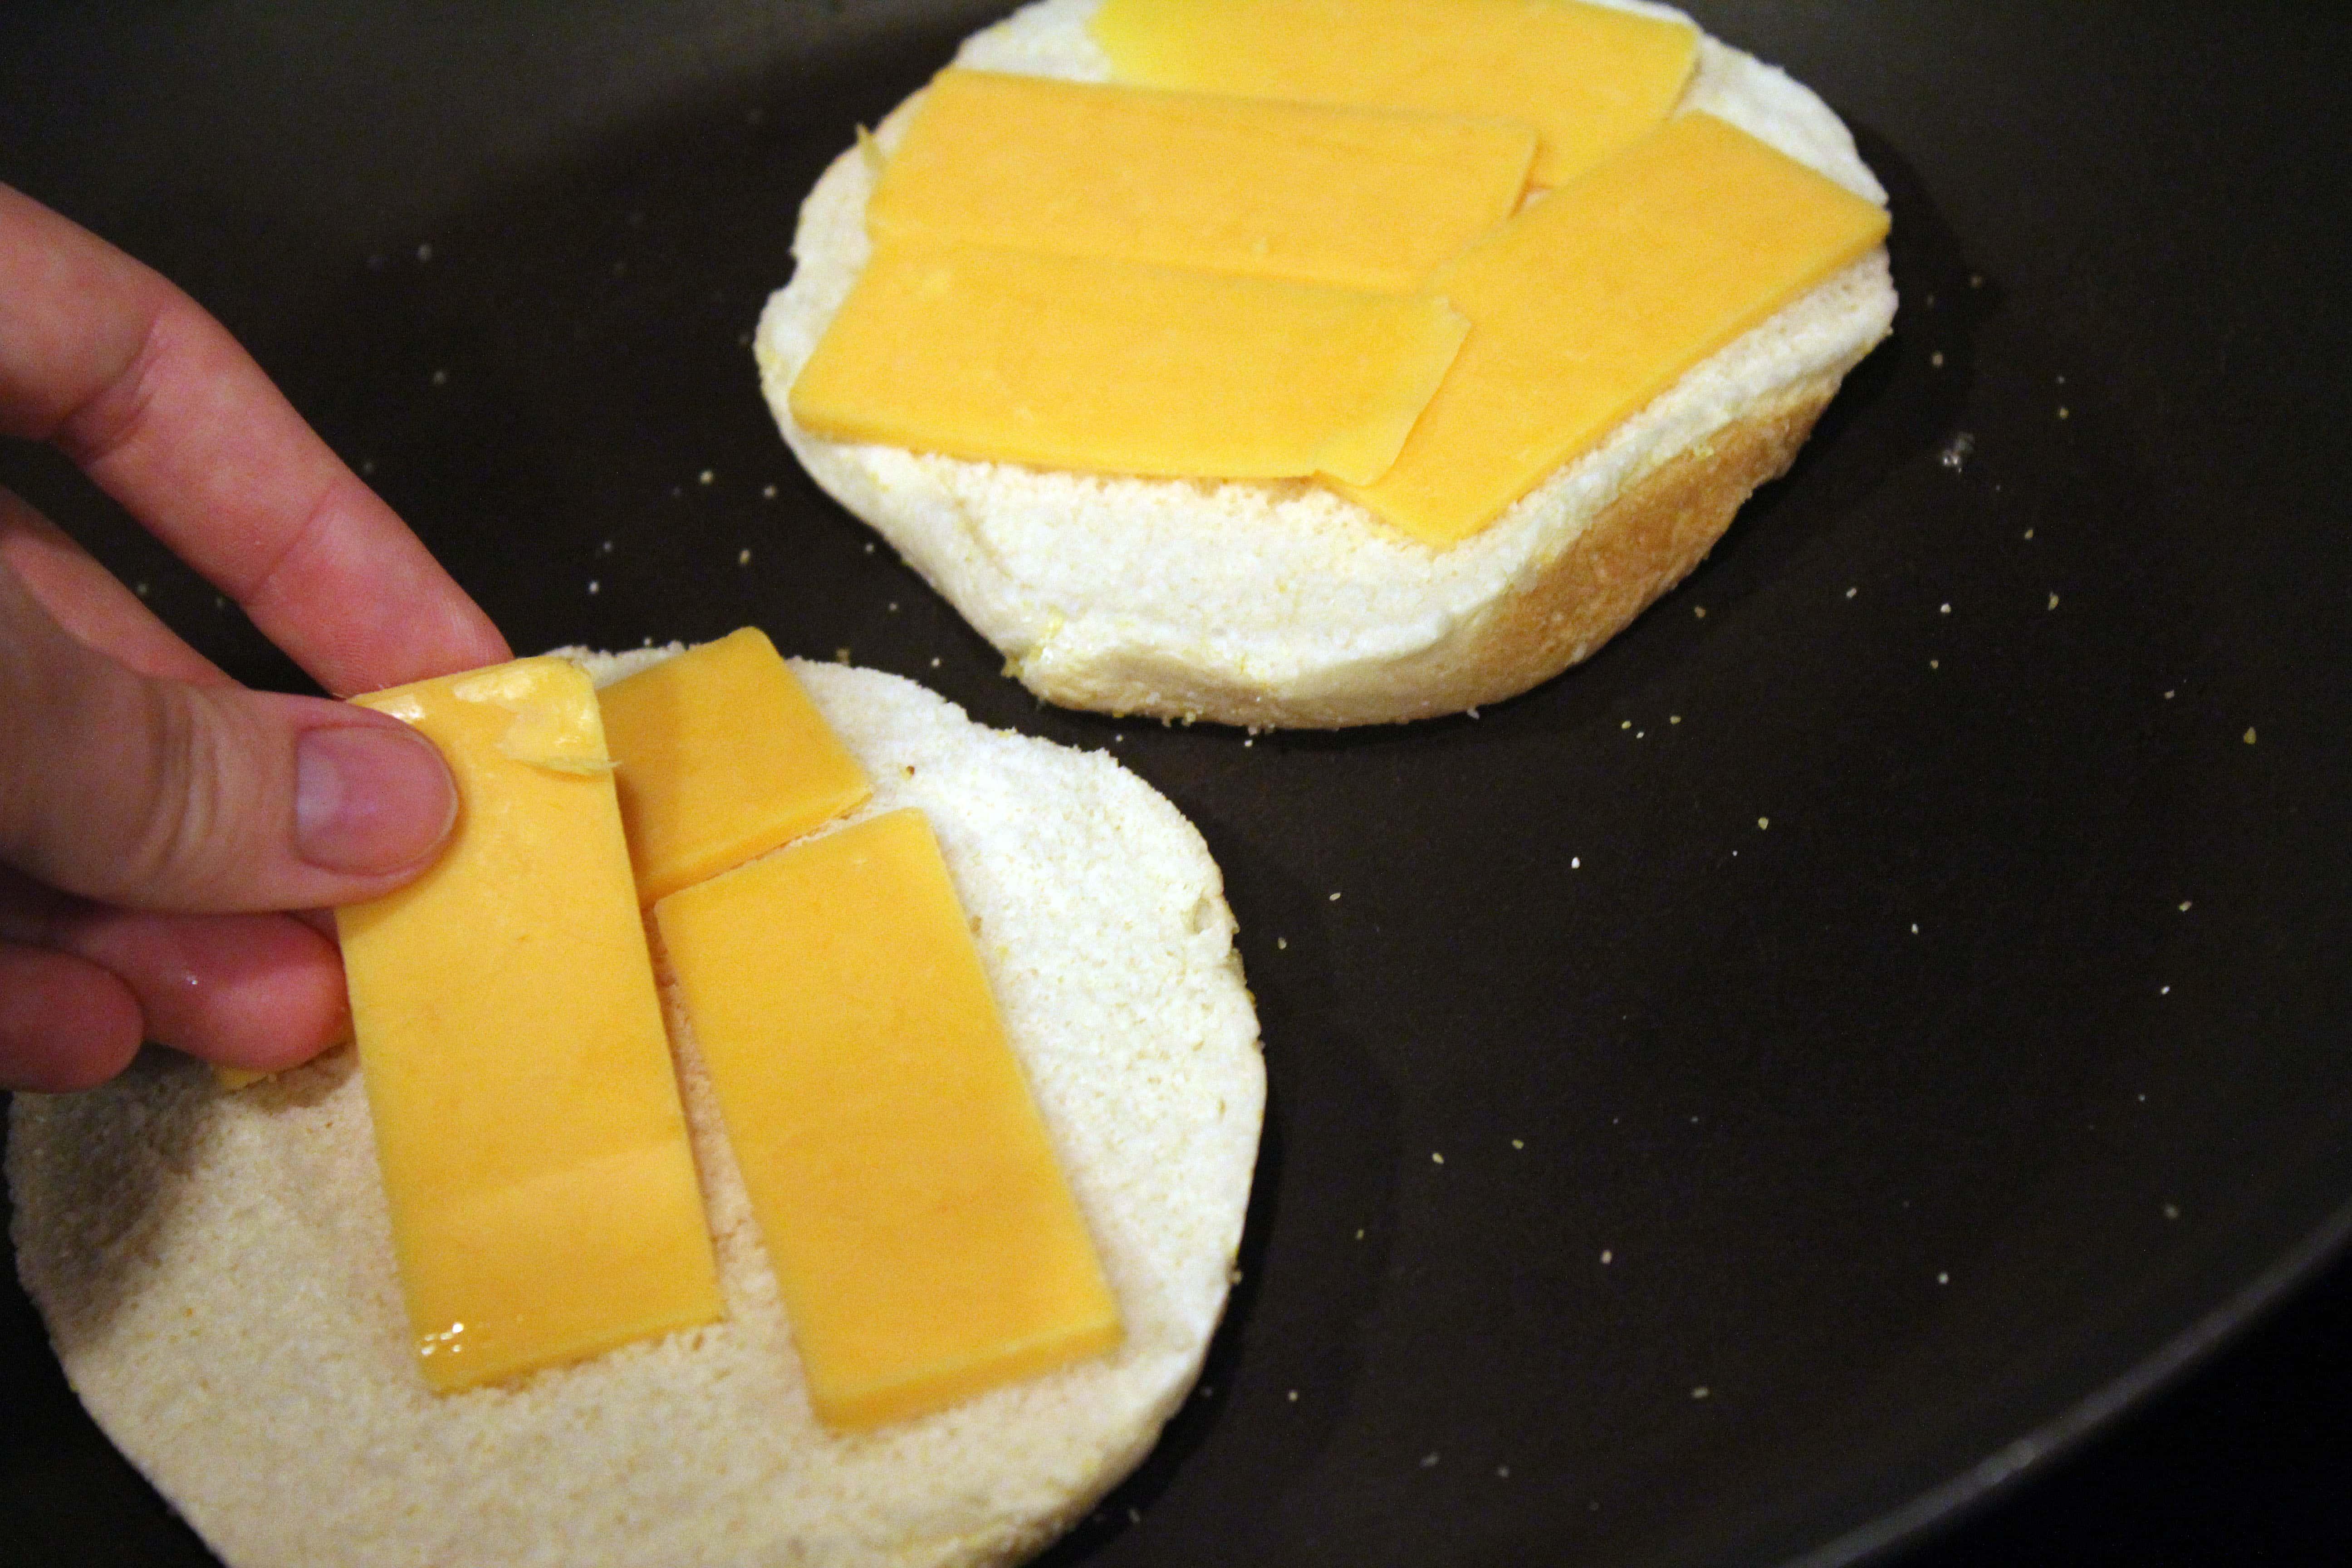 Start melting bottom layer of cheese